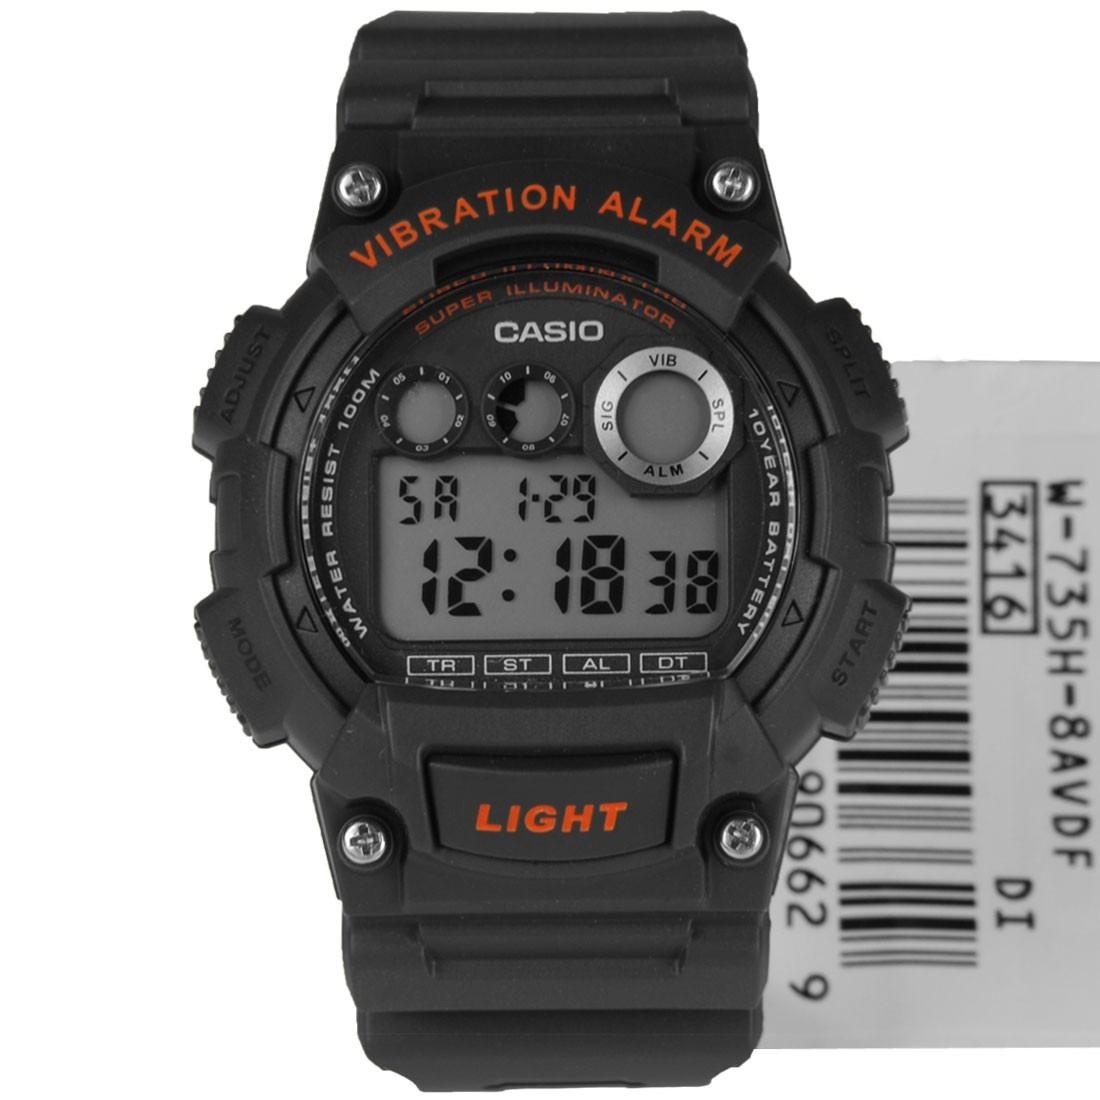 8ac4af4ac6b0 reloj deportivo juvenil casio w-735h gris vibration. Cargando zoom... reloj  deportivo casio. Cargando zoom.